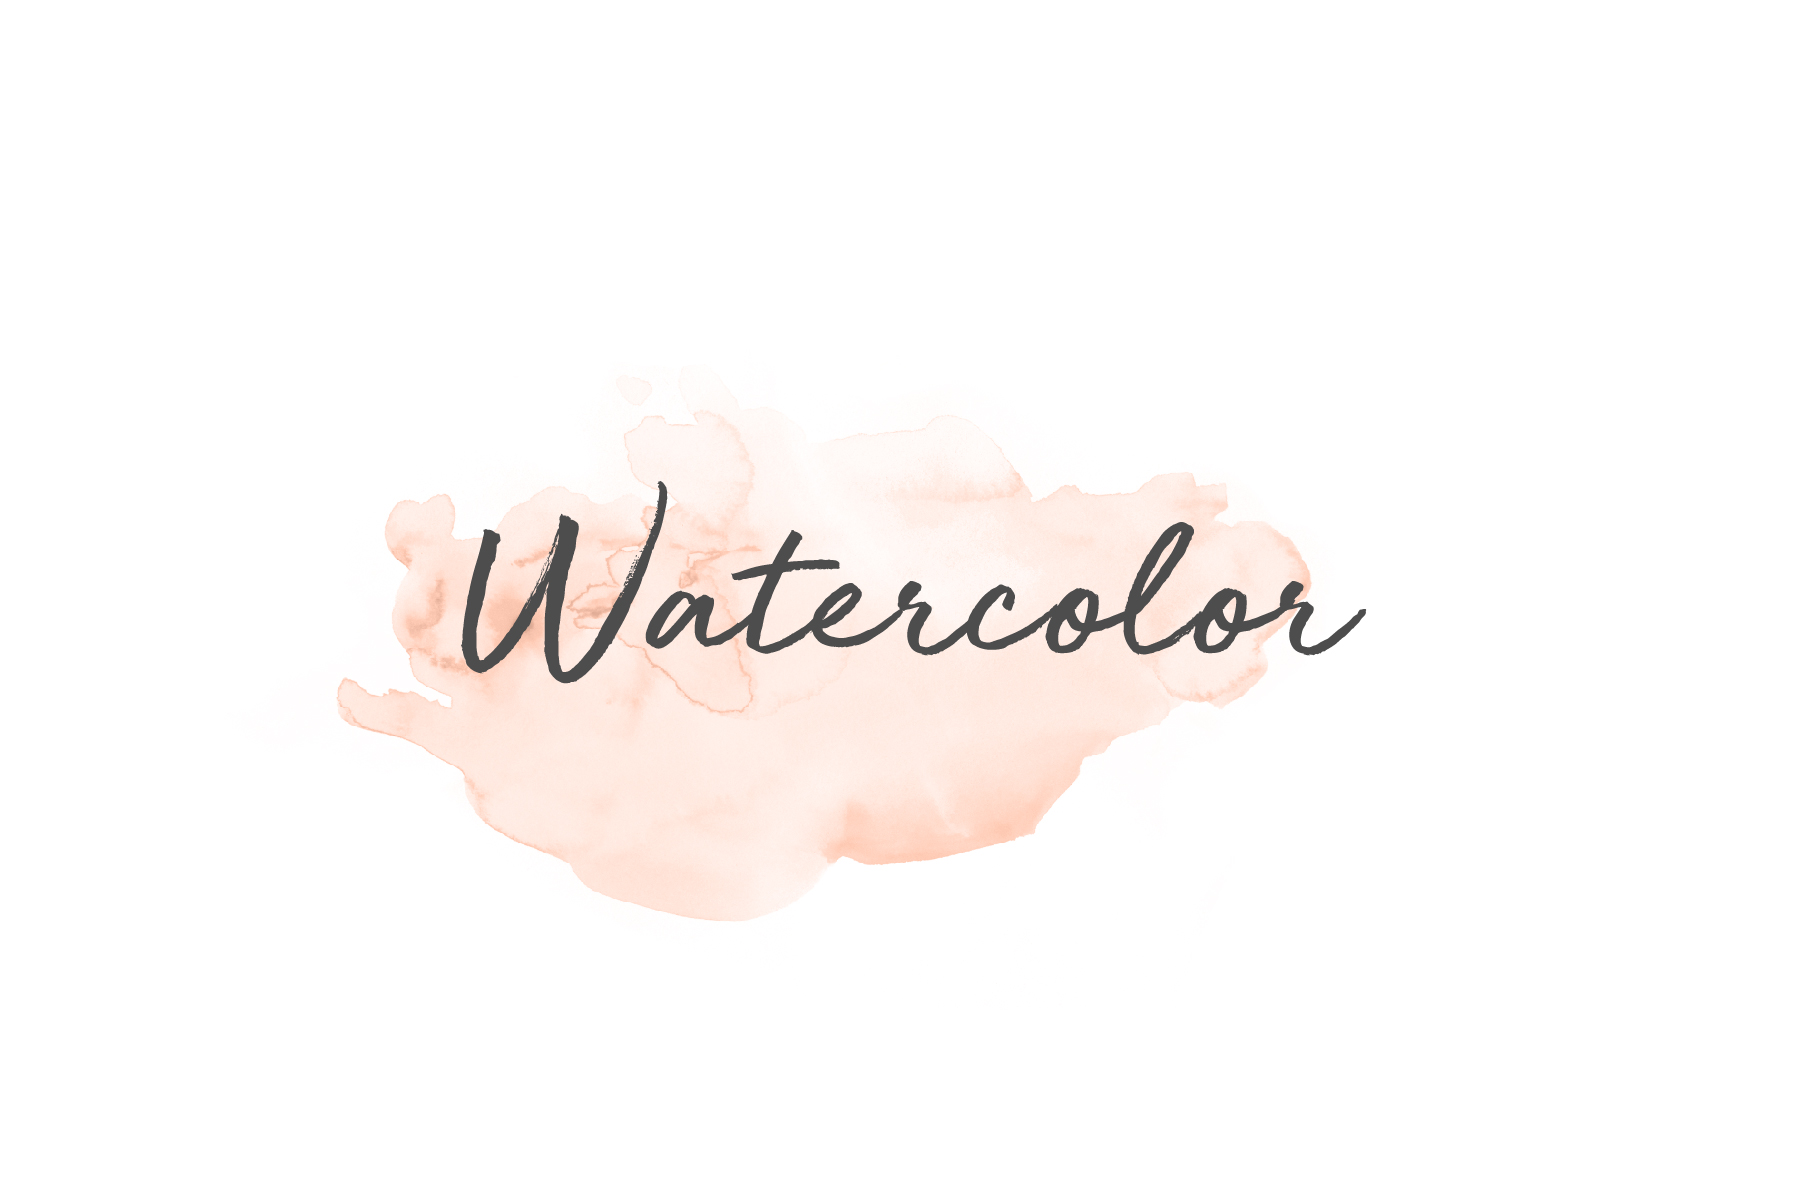 WatercolorIcon.jpg